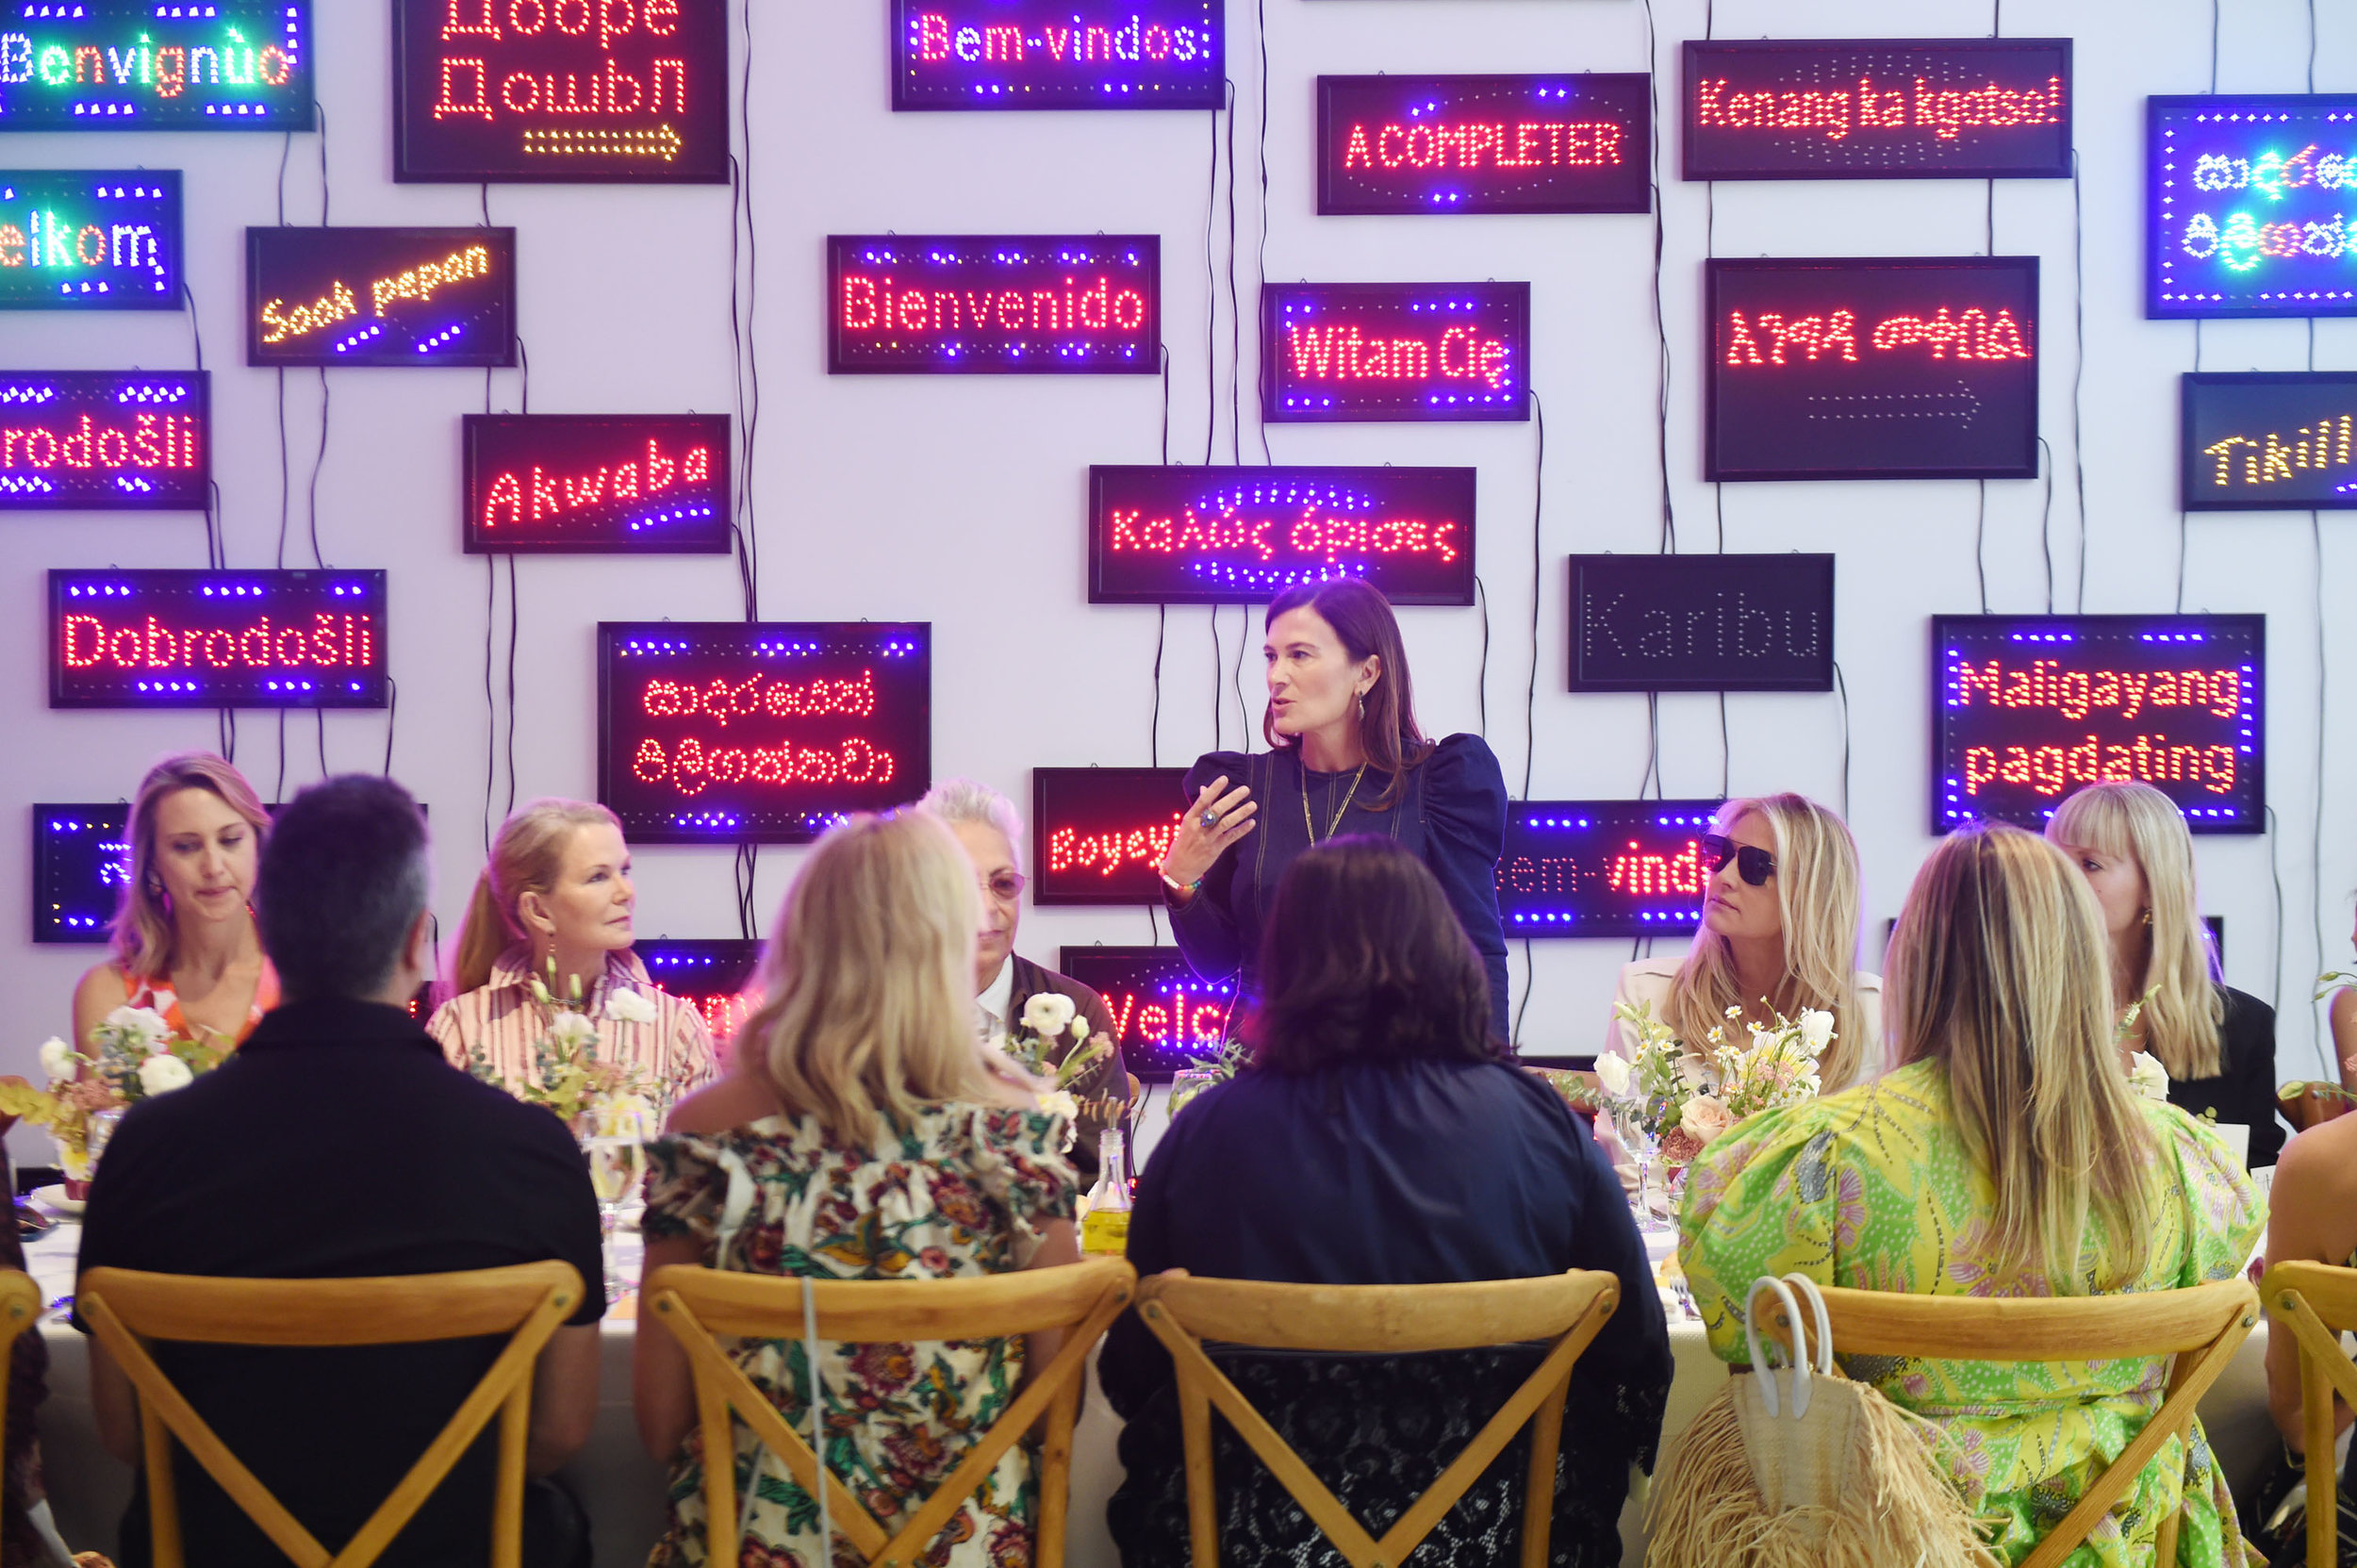 Sarah Harrelson speaking8.jpg